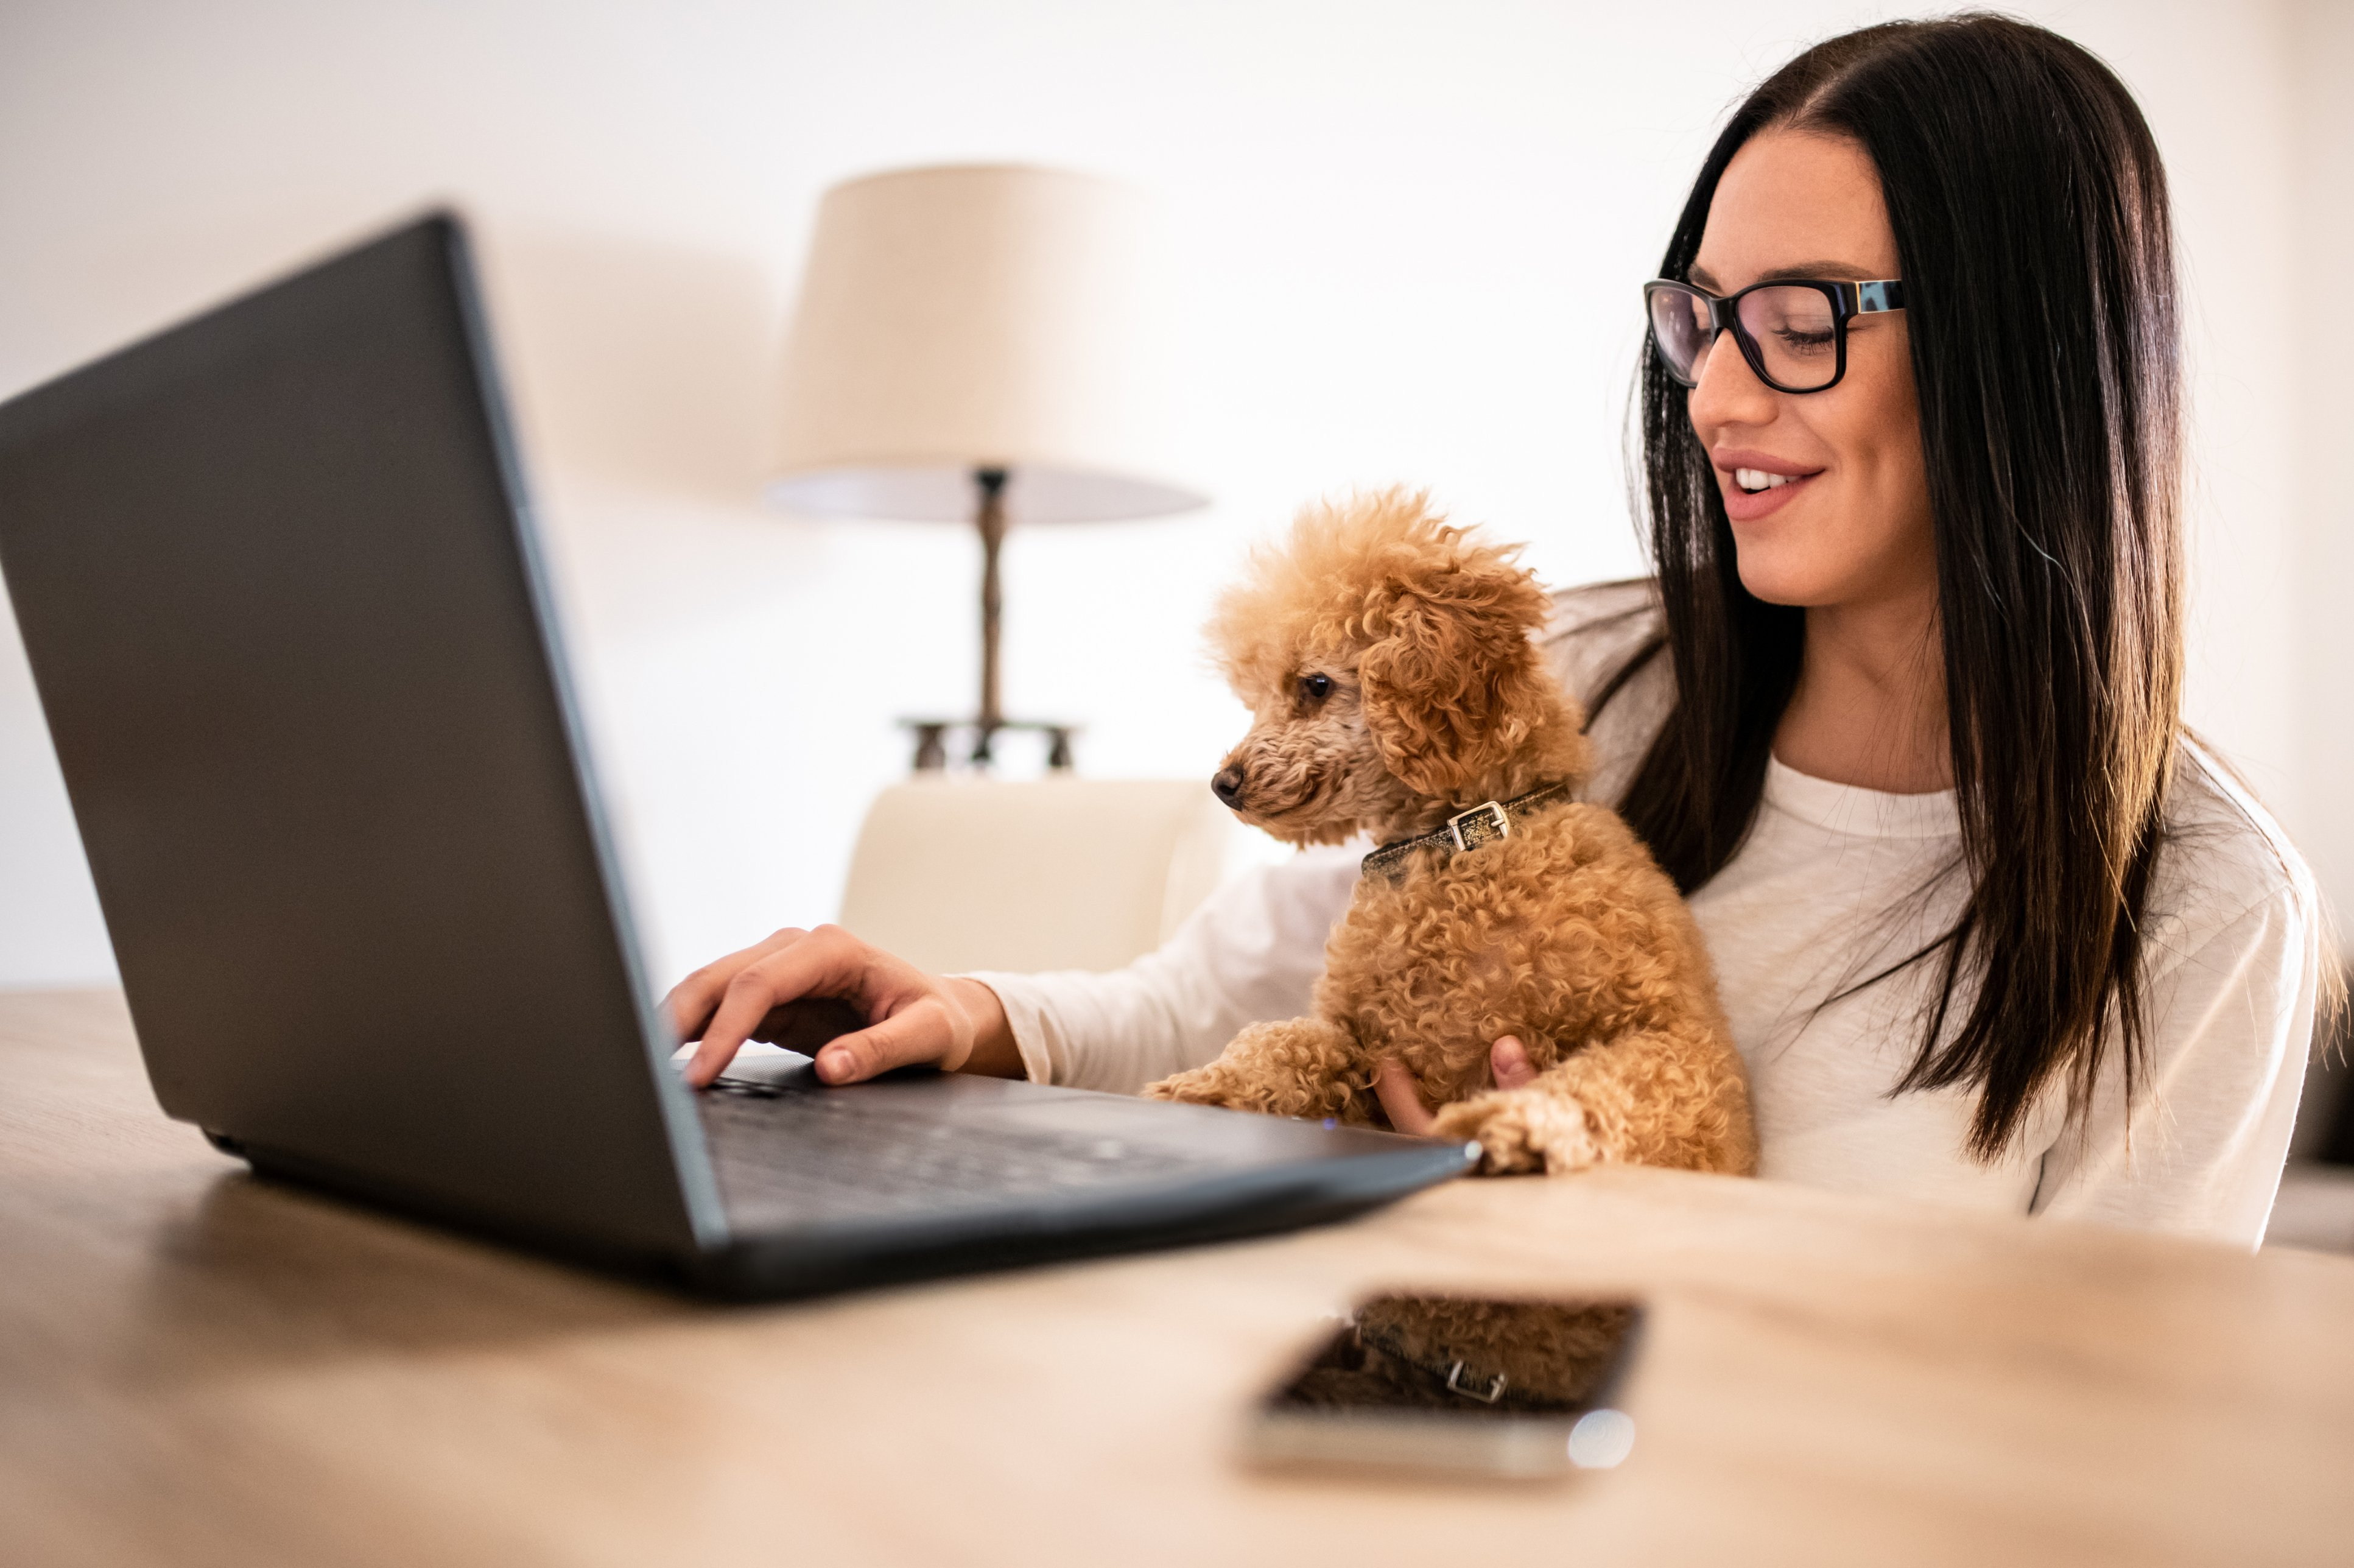 Dog & Owner online shopping